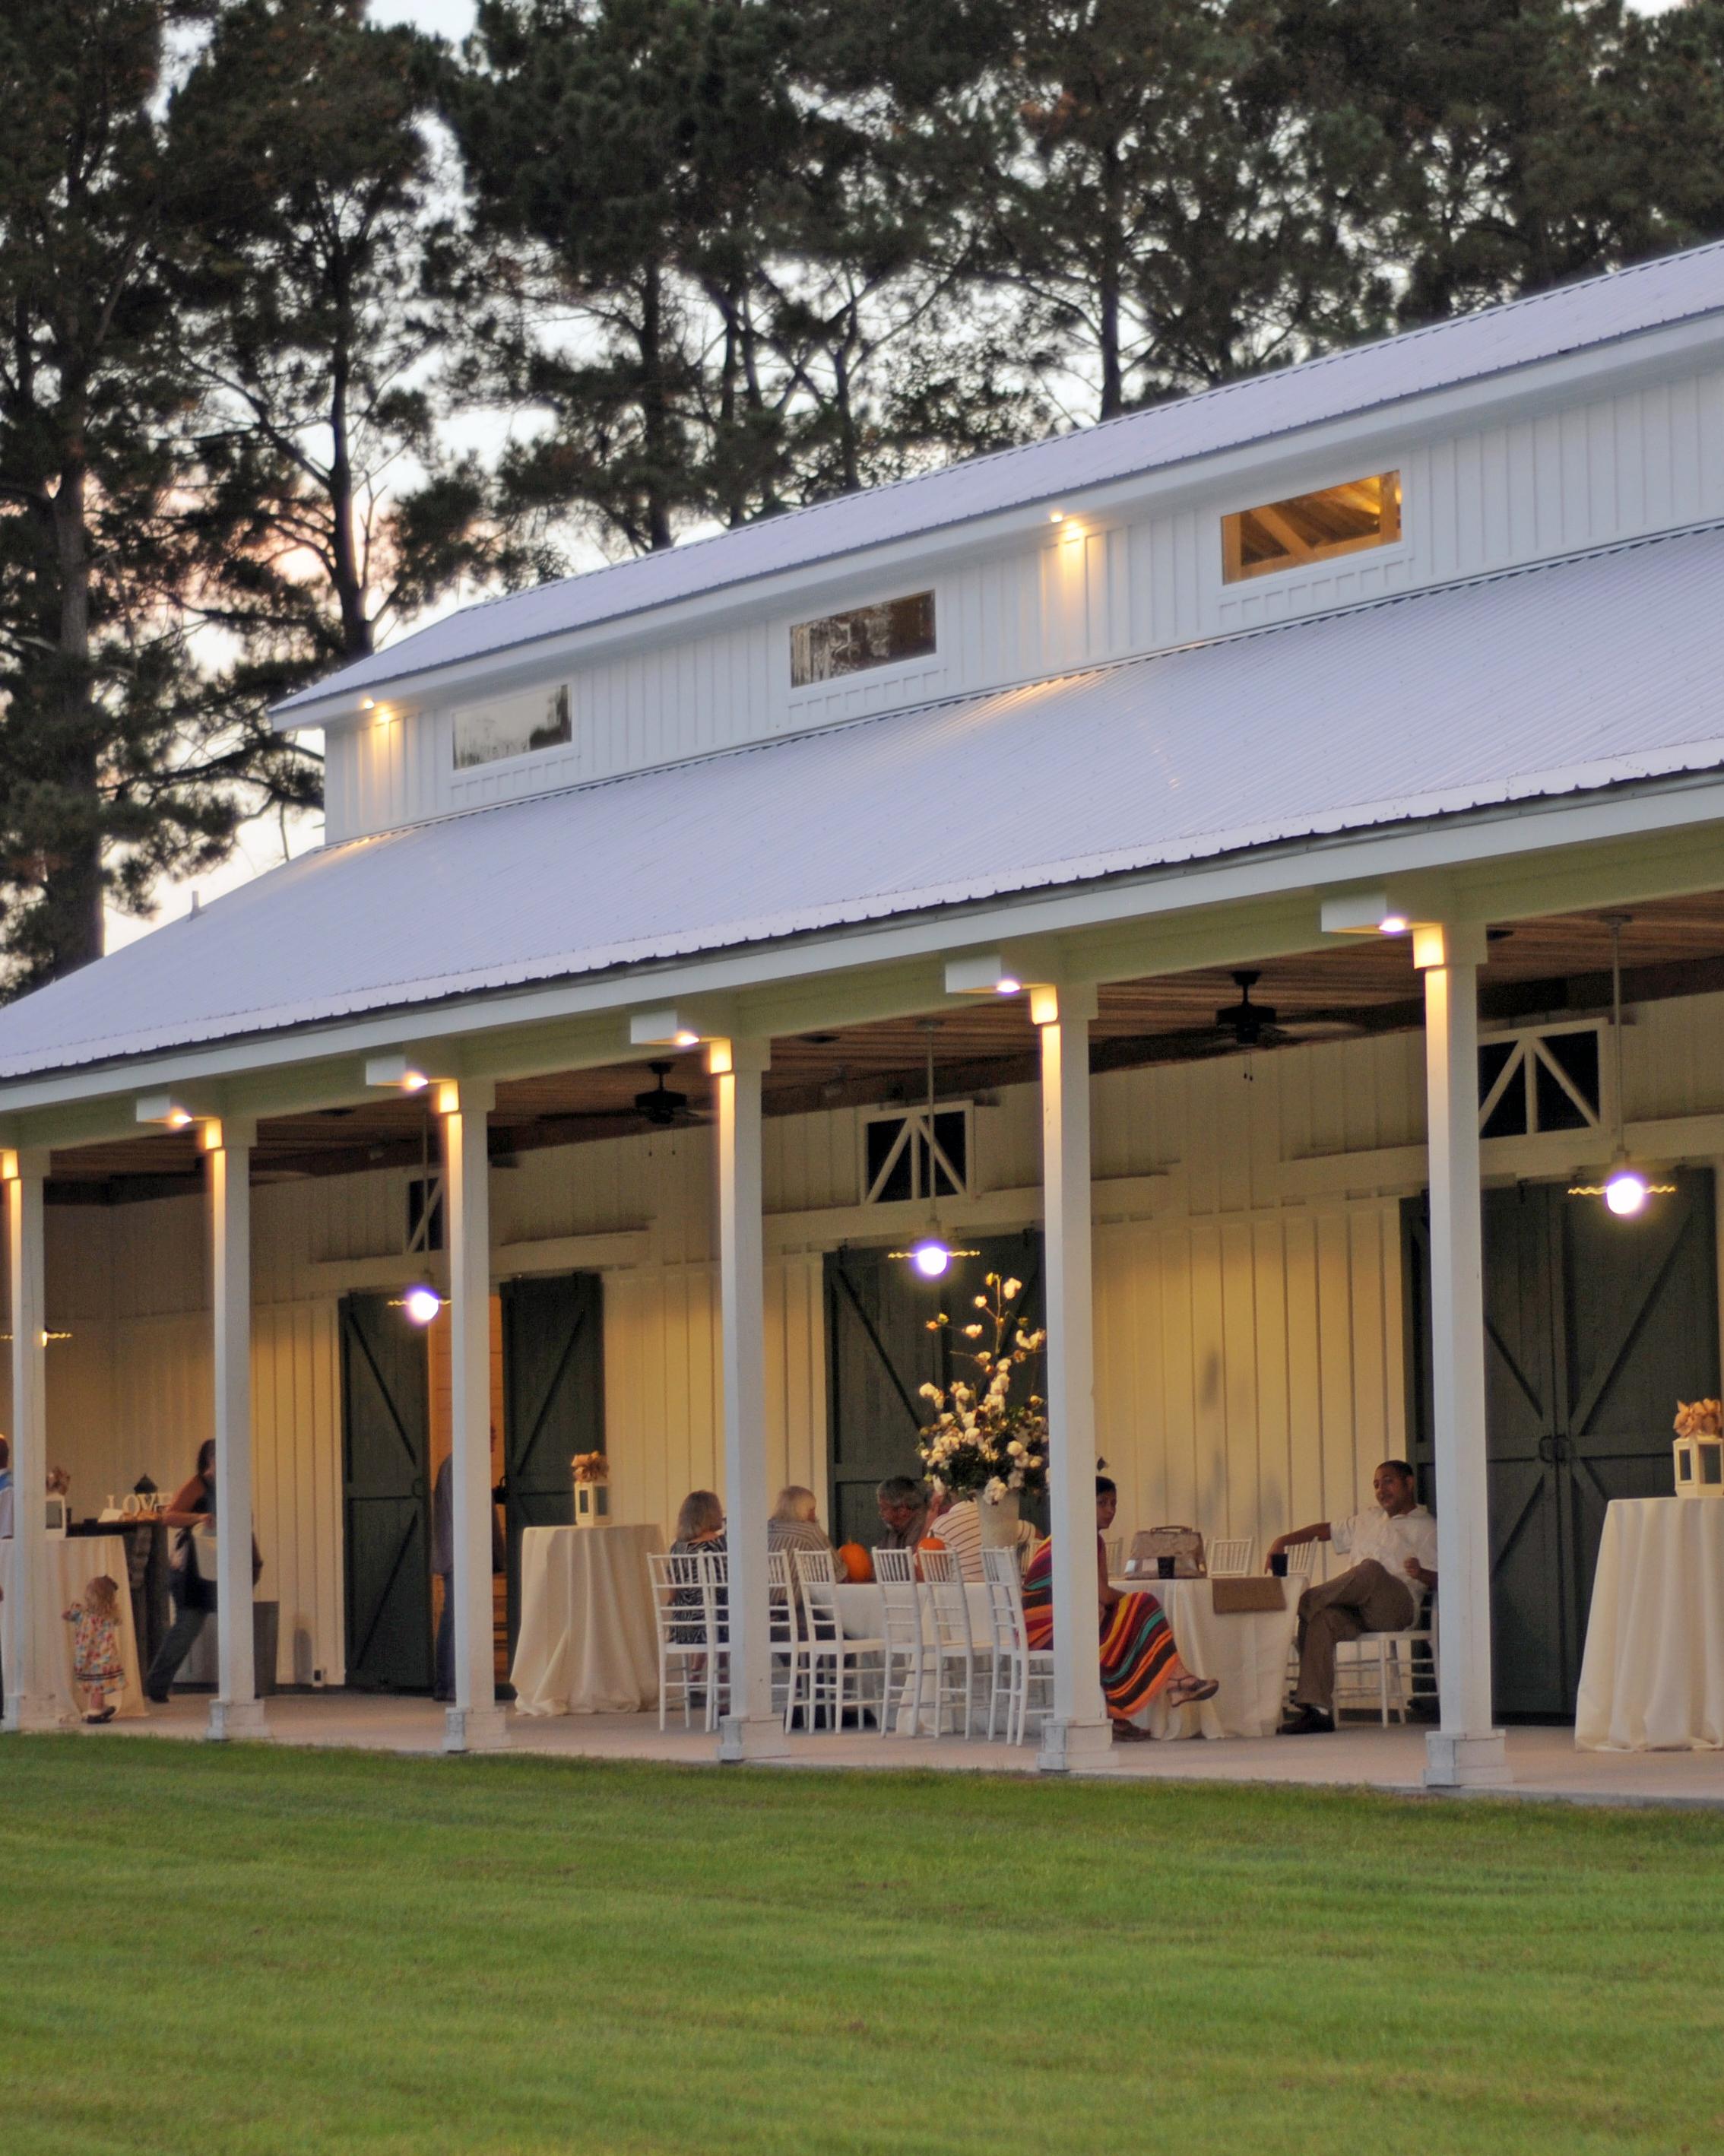 location-scout-wildberry-farm-barn-porch-1014.jpg